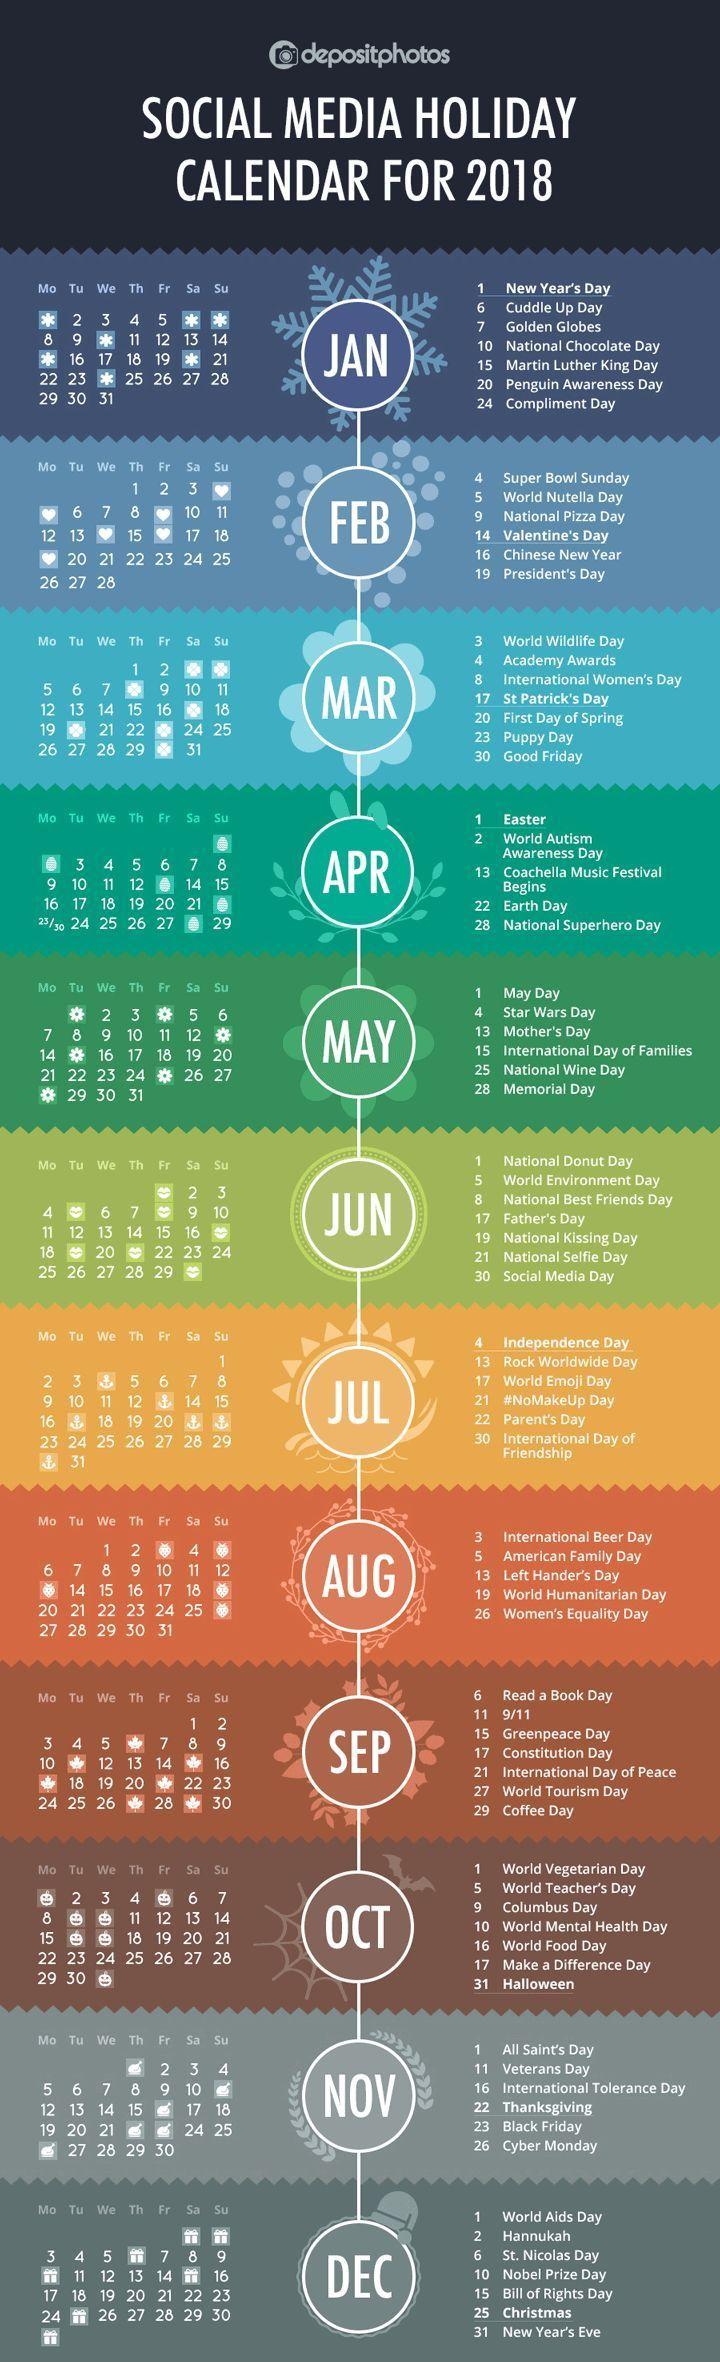 100 Social Media Holidays You Need In 2020 21 Indispensable Marketing Strategy Social Media Social Media Calendar Media Marketing